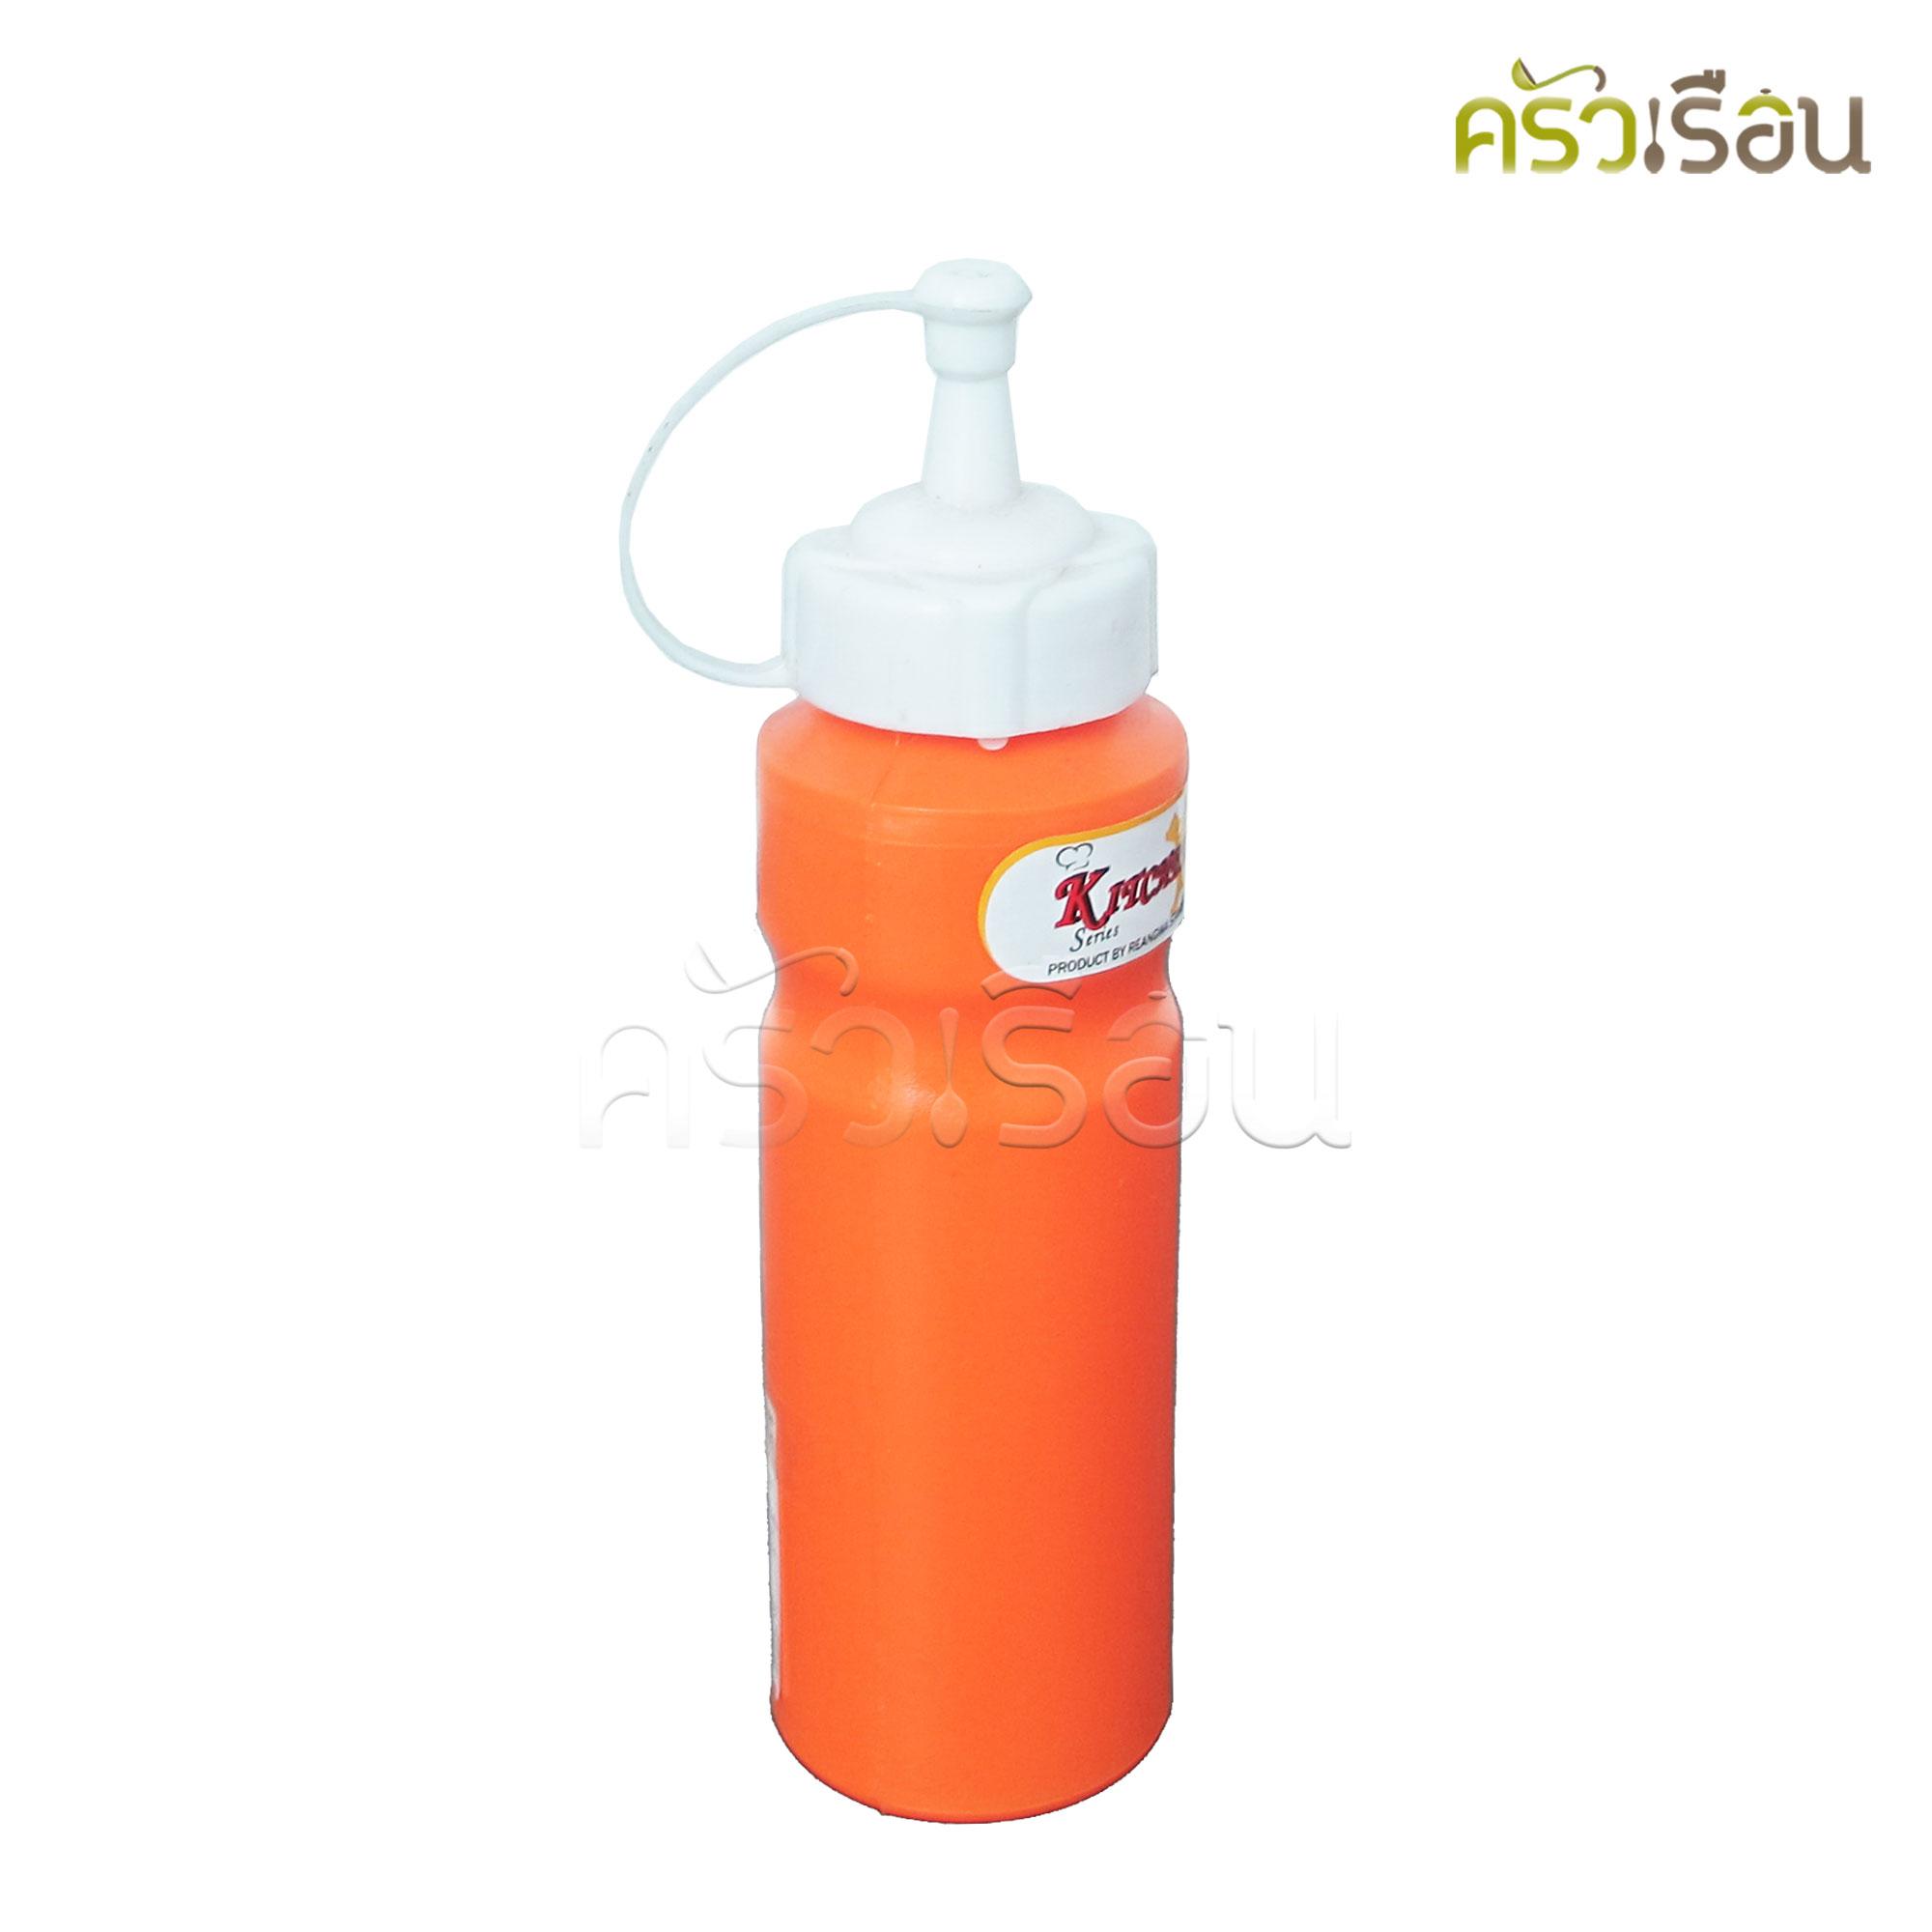 Reangwa Standard - ขวดซอสพลาสติก ส้ม 240 ml. 9040